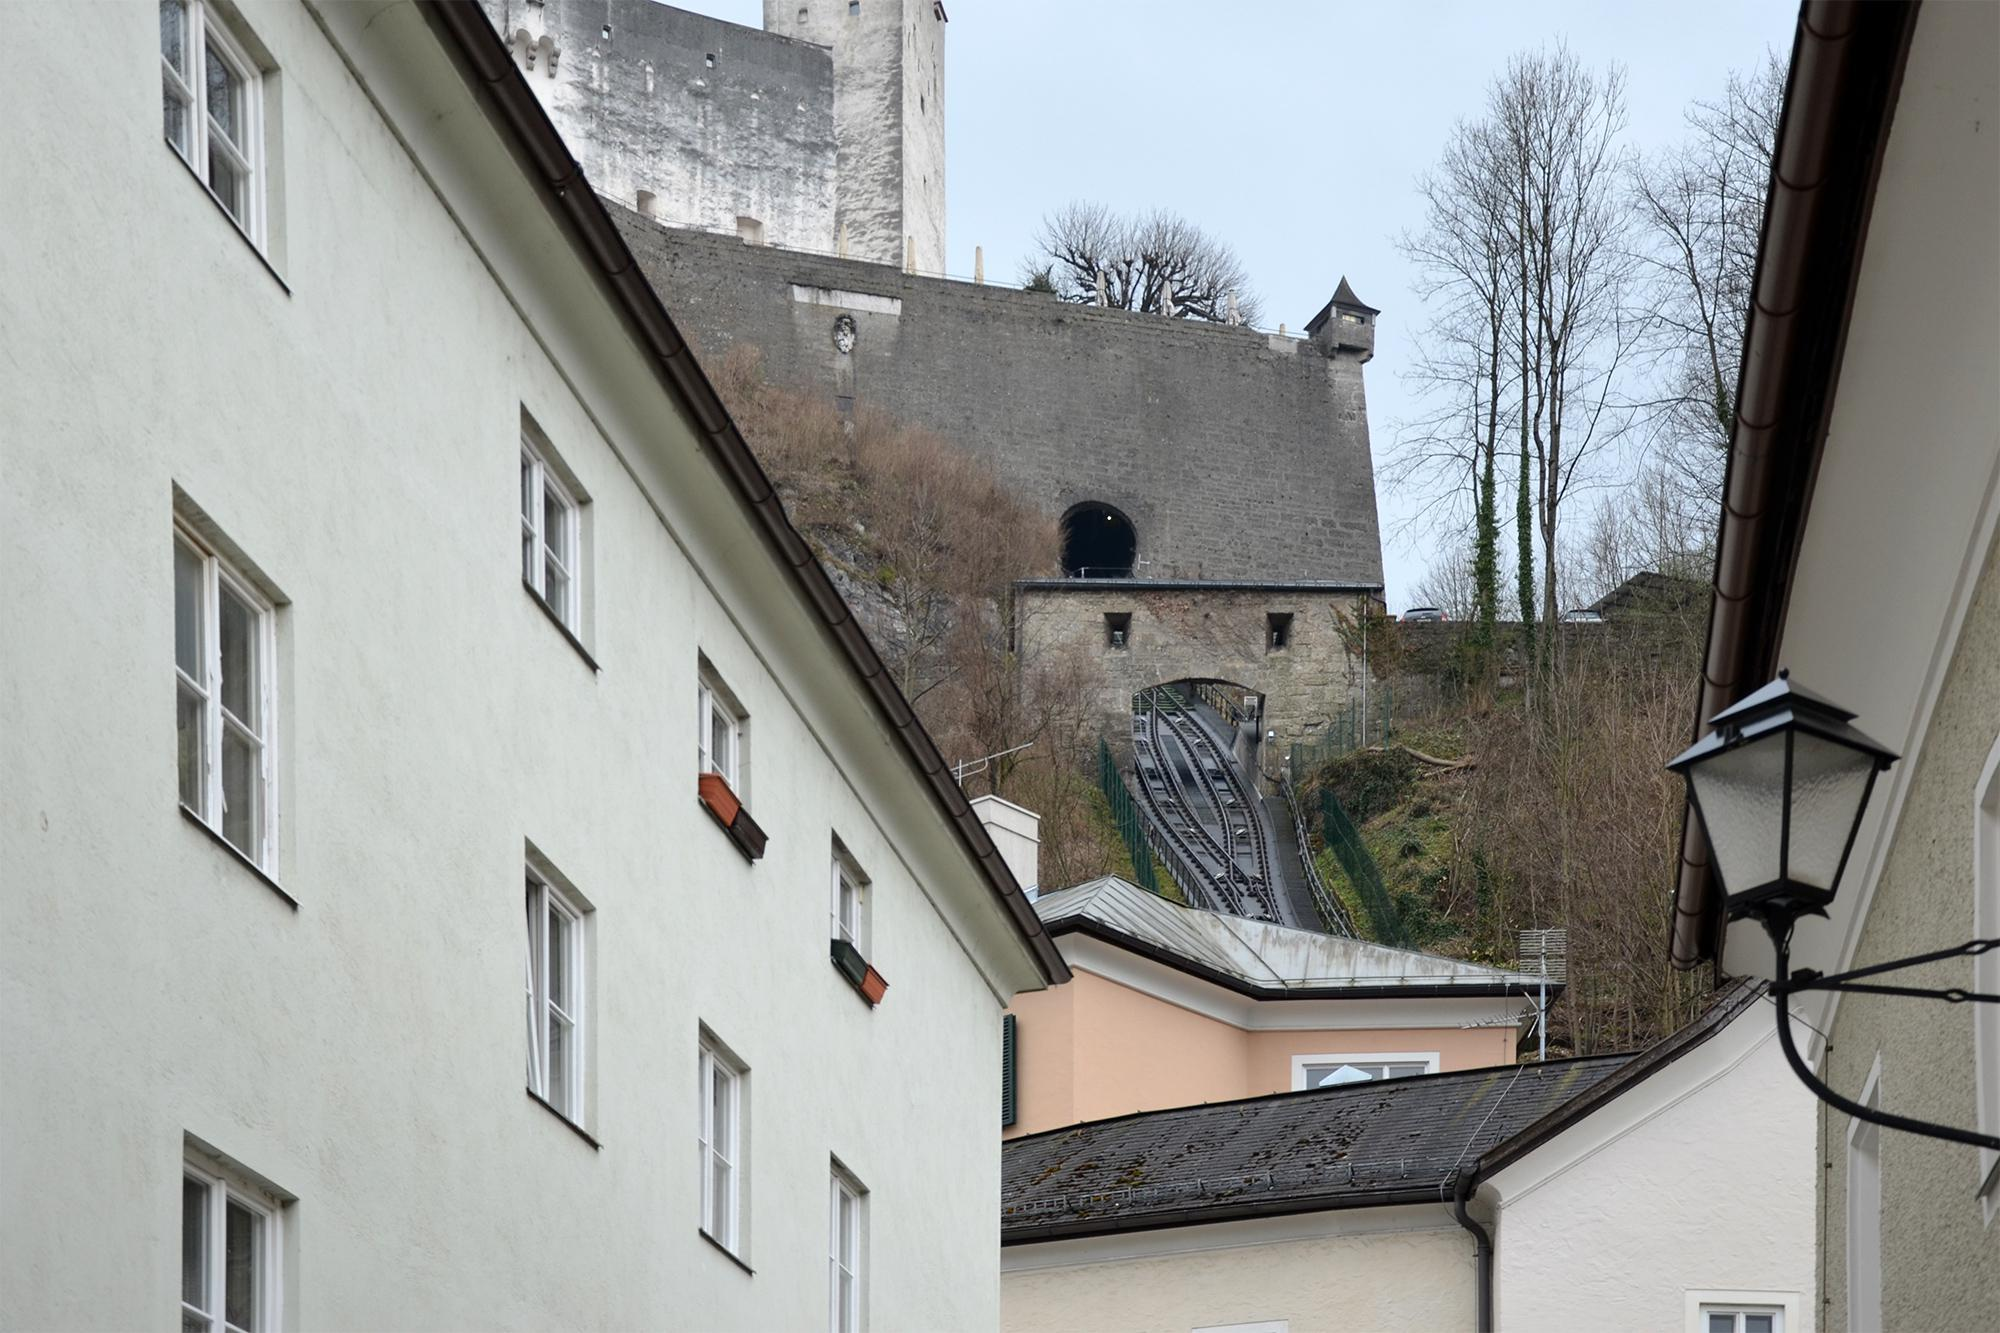 Festungsbahn Funicular, Salzburg, Austria